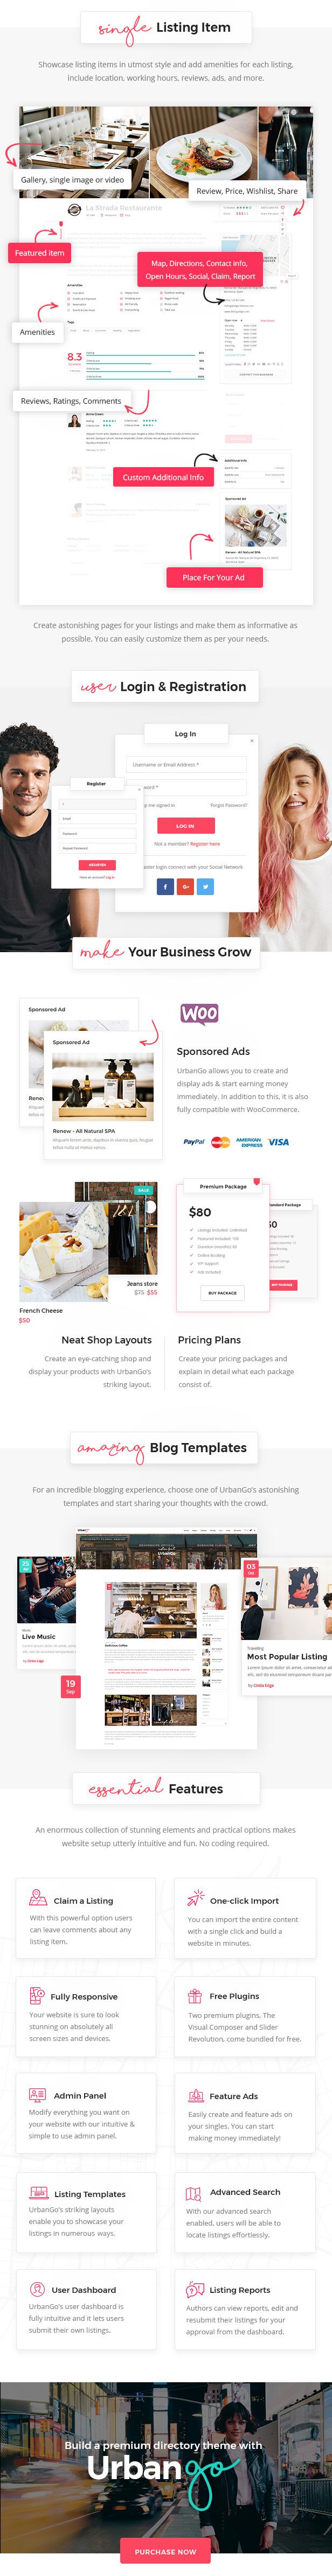 UrbanGo - Directory and Listing WordPress Theme - 4